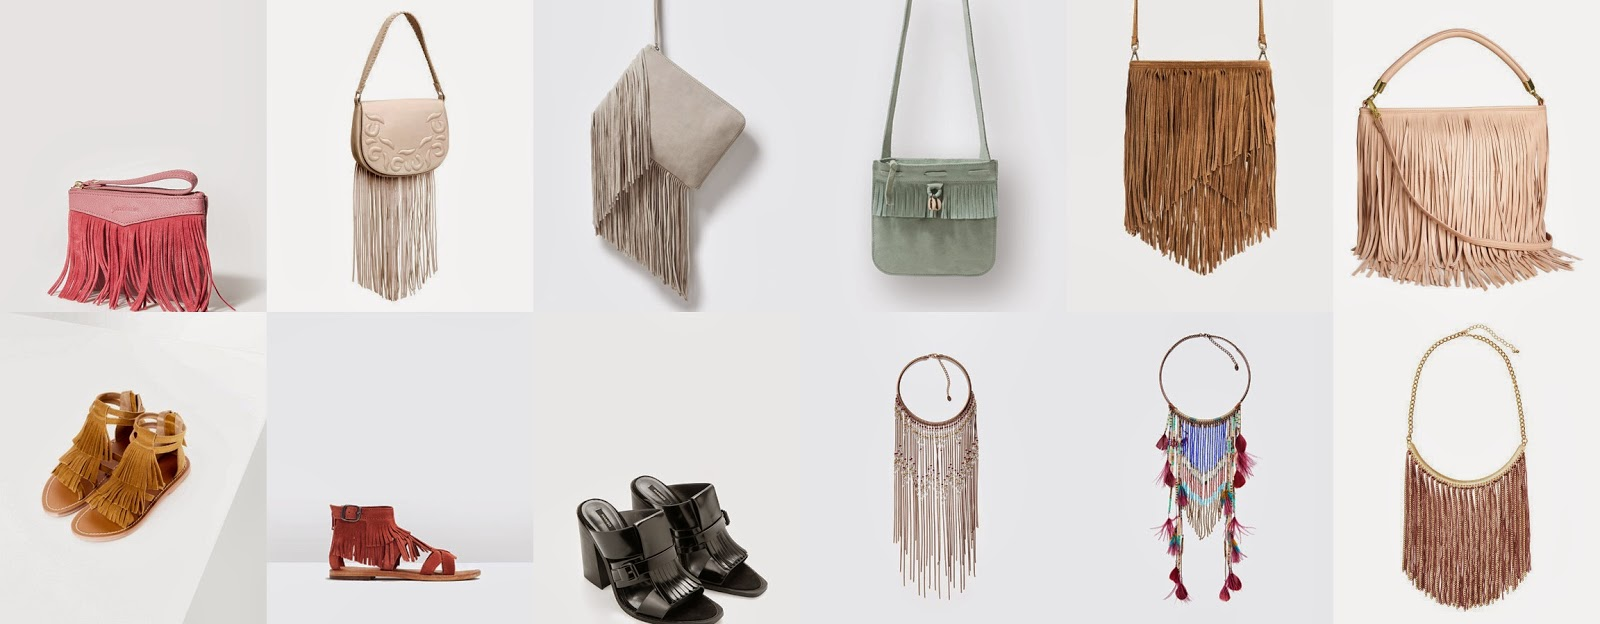 Malas, sandálias, colares com franjas - 2015 H&M, Zara, Mango, Stradivarius